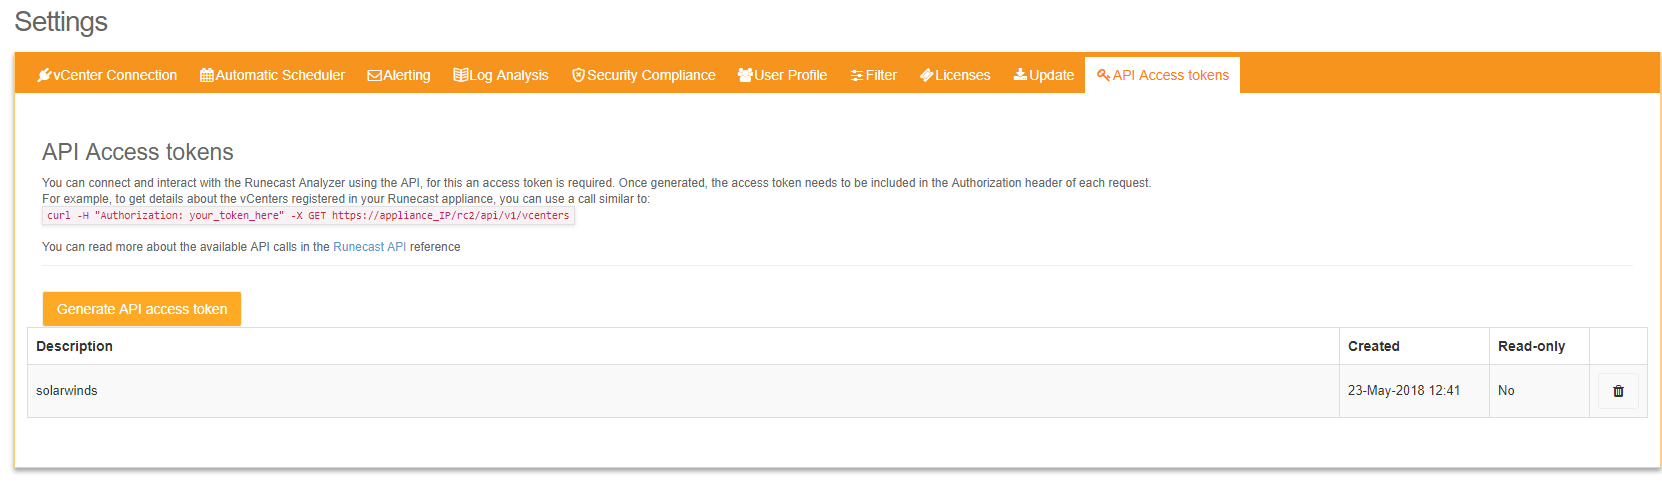 API Access tokens